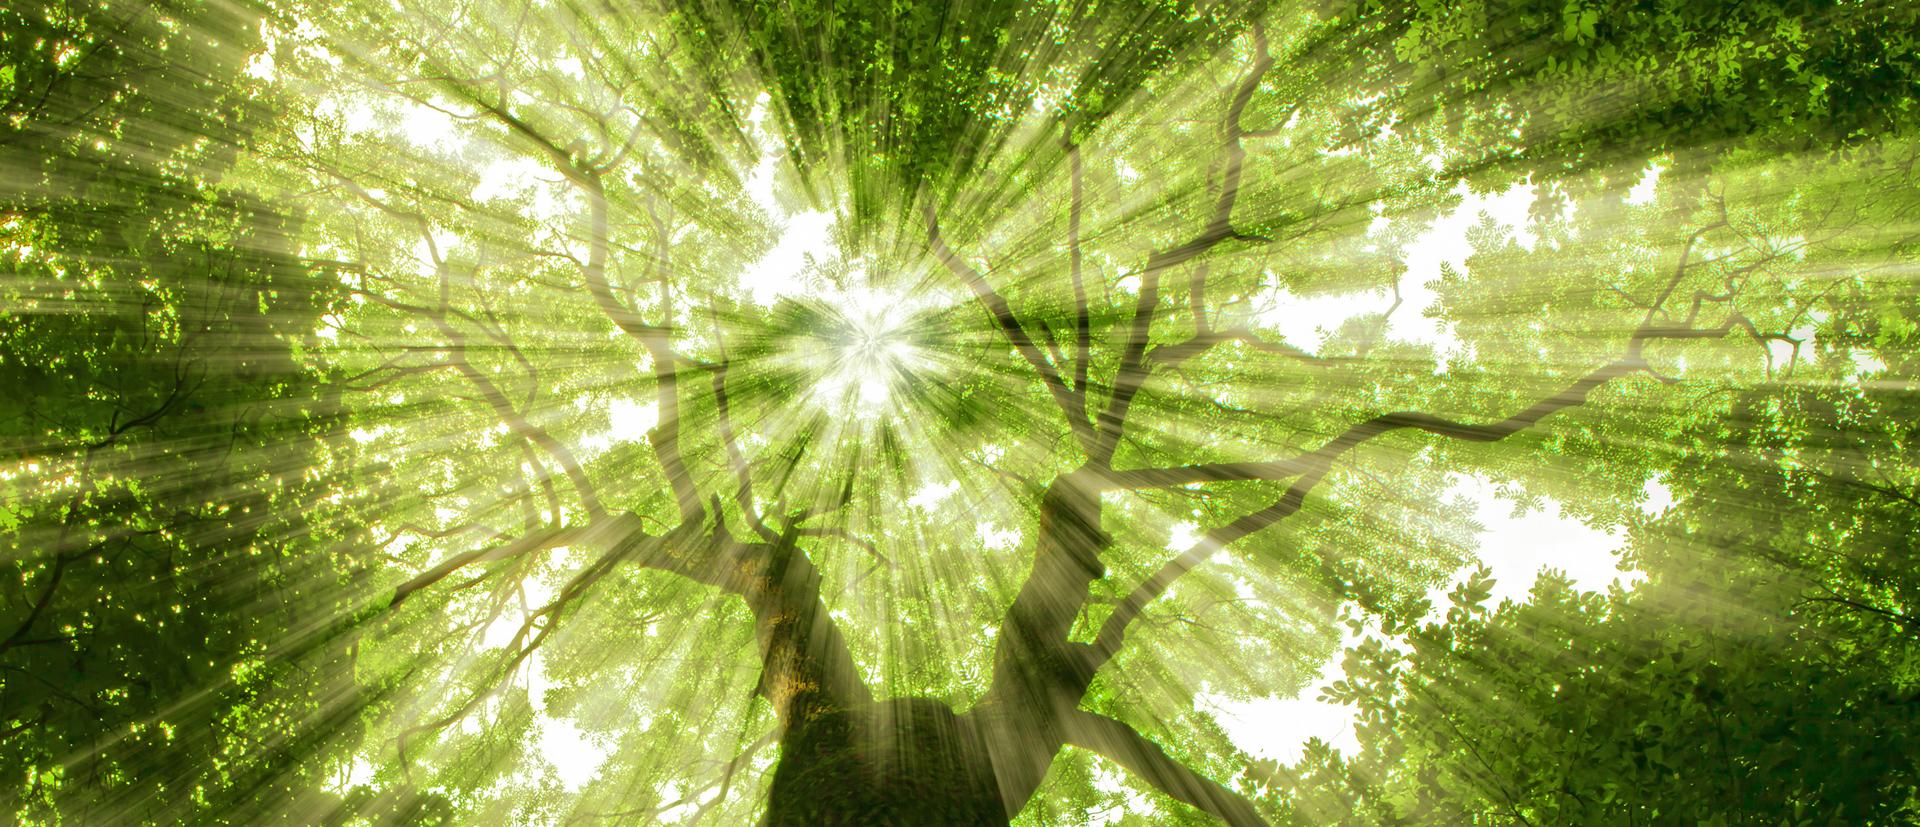 sun rays through the tree leaves